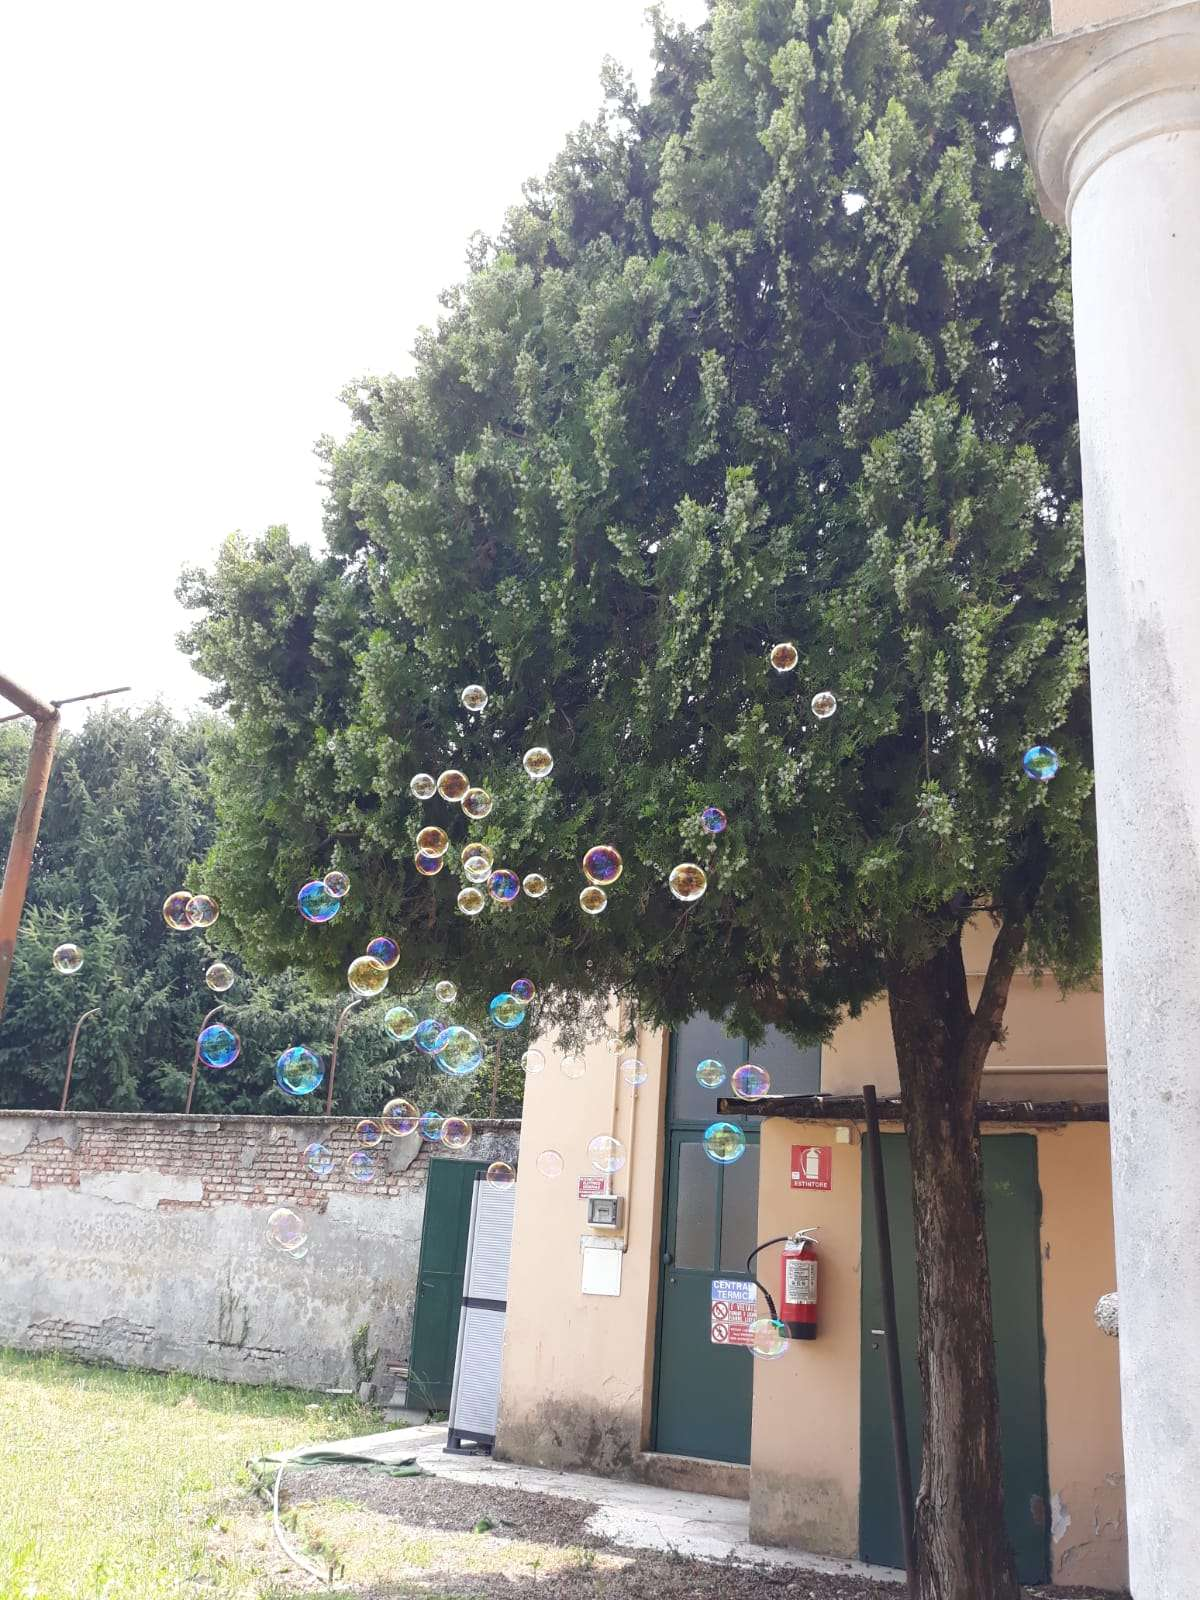 IMG 20190803 WA0039 - Scuola Materna Peschiera Borromeo